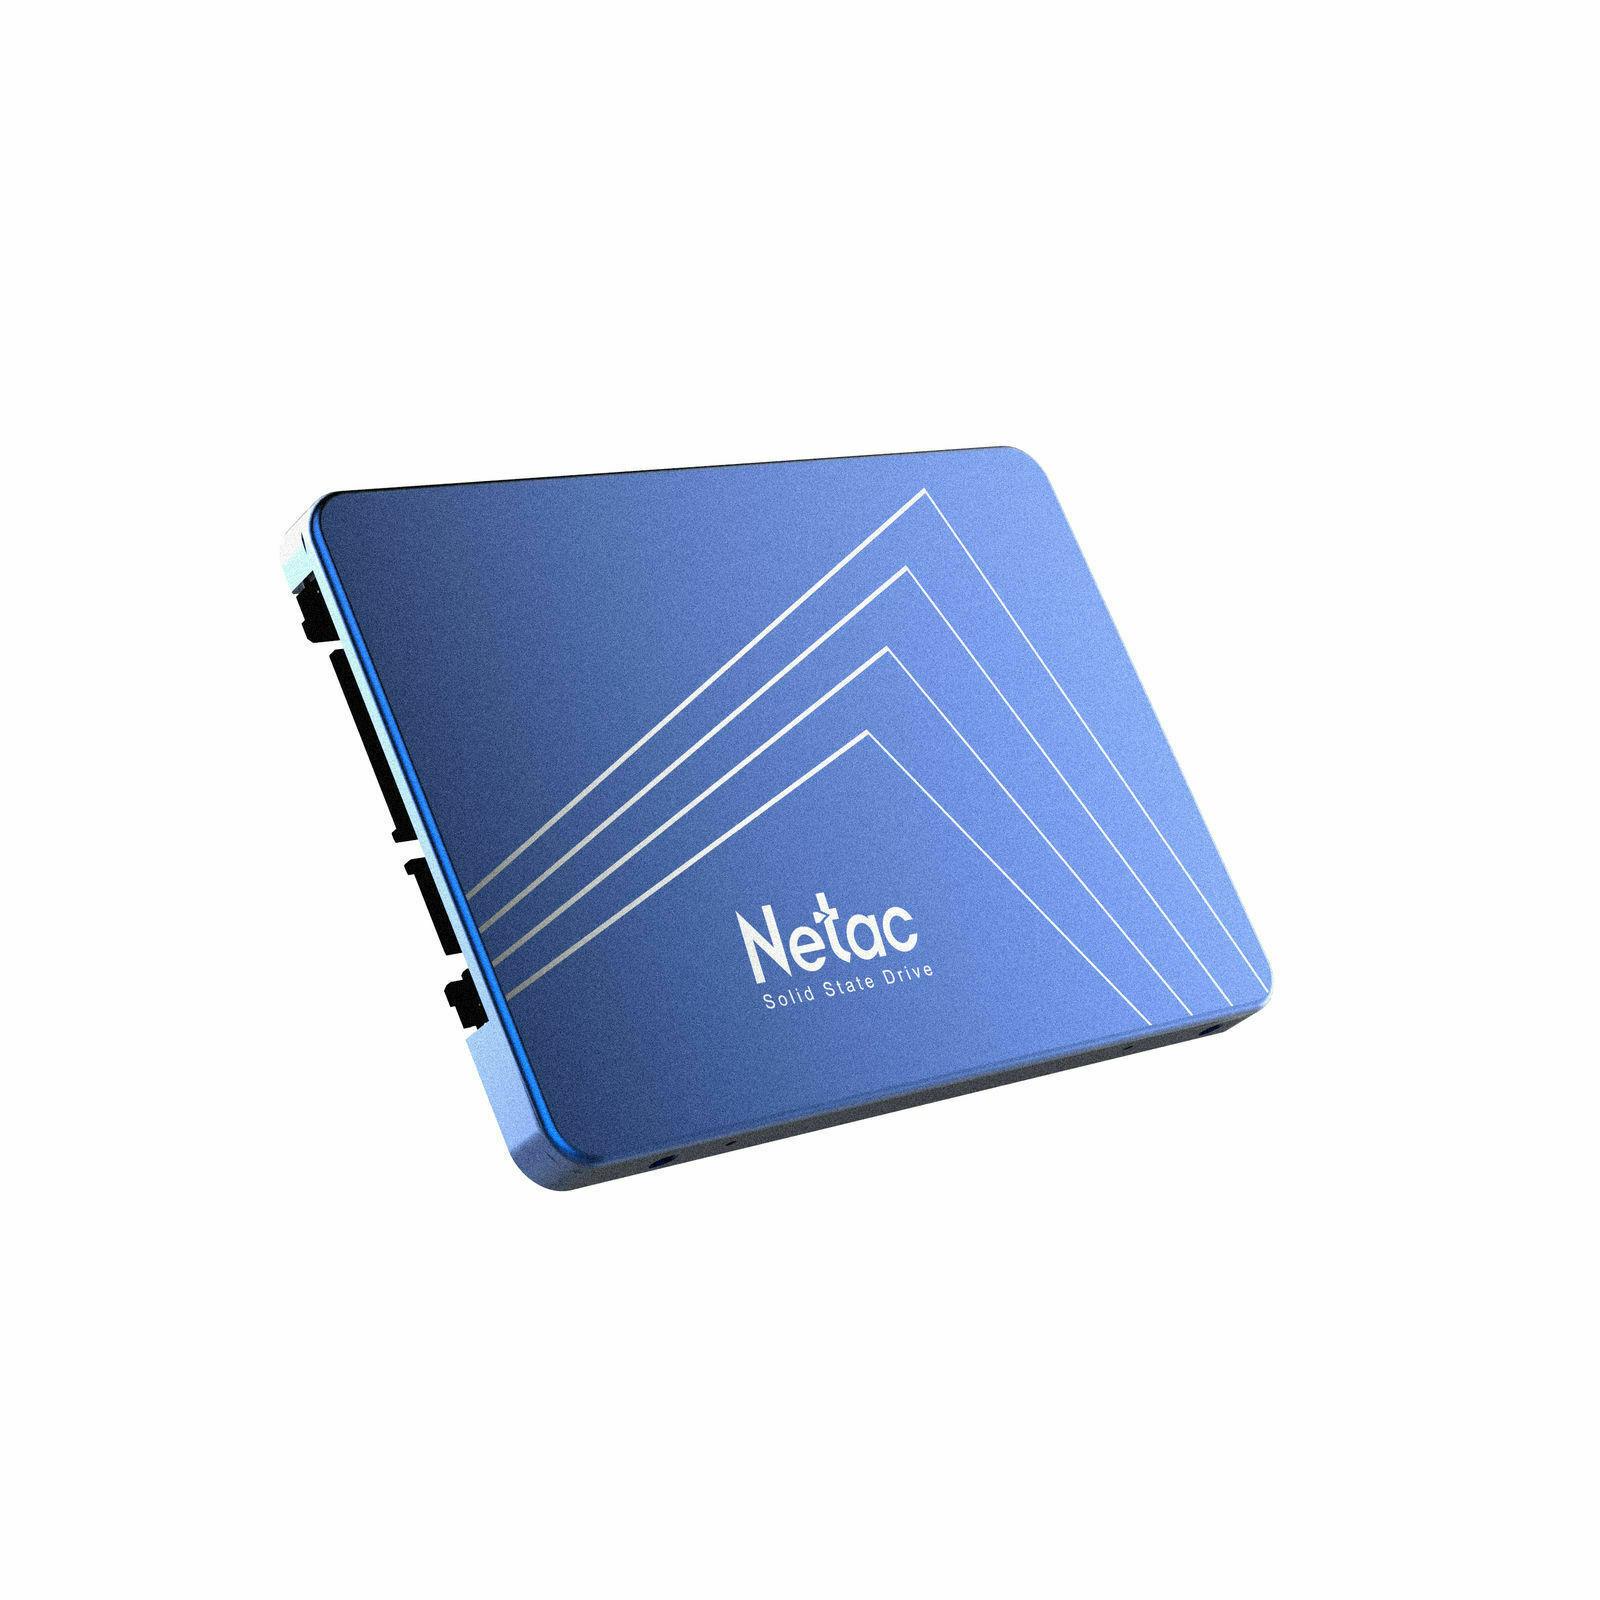 Rígido do Ssd de Netac Ssd do Disco Ssd para o Portátil Disco Rígido Interno 240g Ssd Sata3 120 gb 240 60g 480g